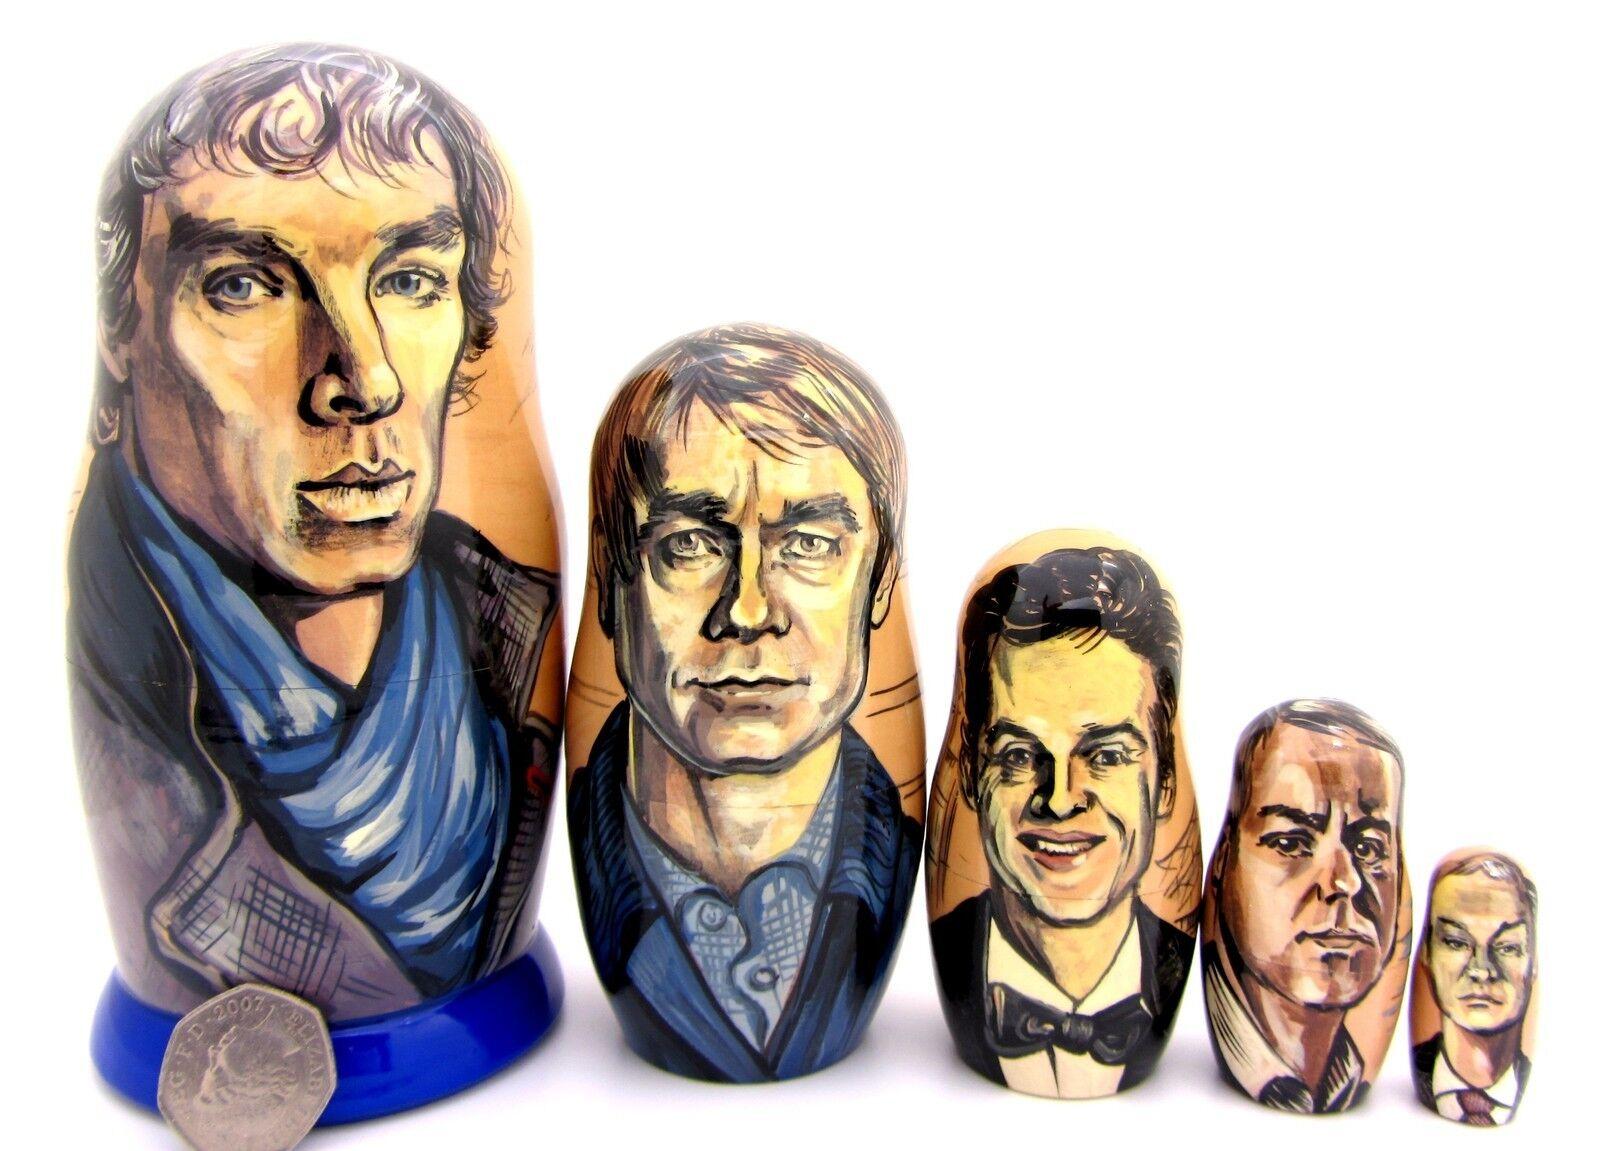 Nesting Muñecas Rusas Bbc Sherlock 5 Holmes Dr John Watson Moriarty Cumberbatch